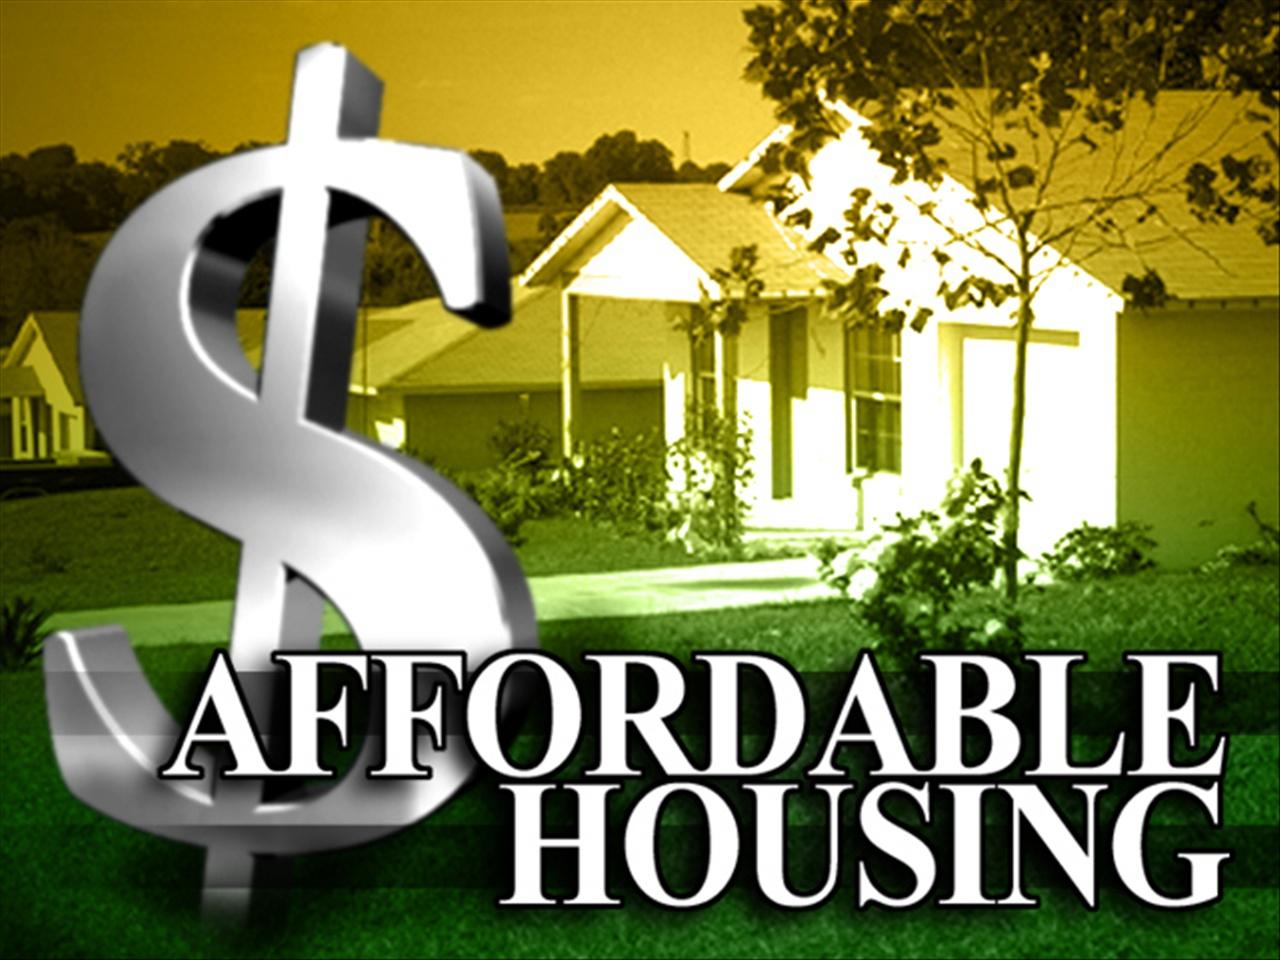 affordablehousing_21822